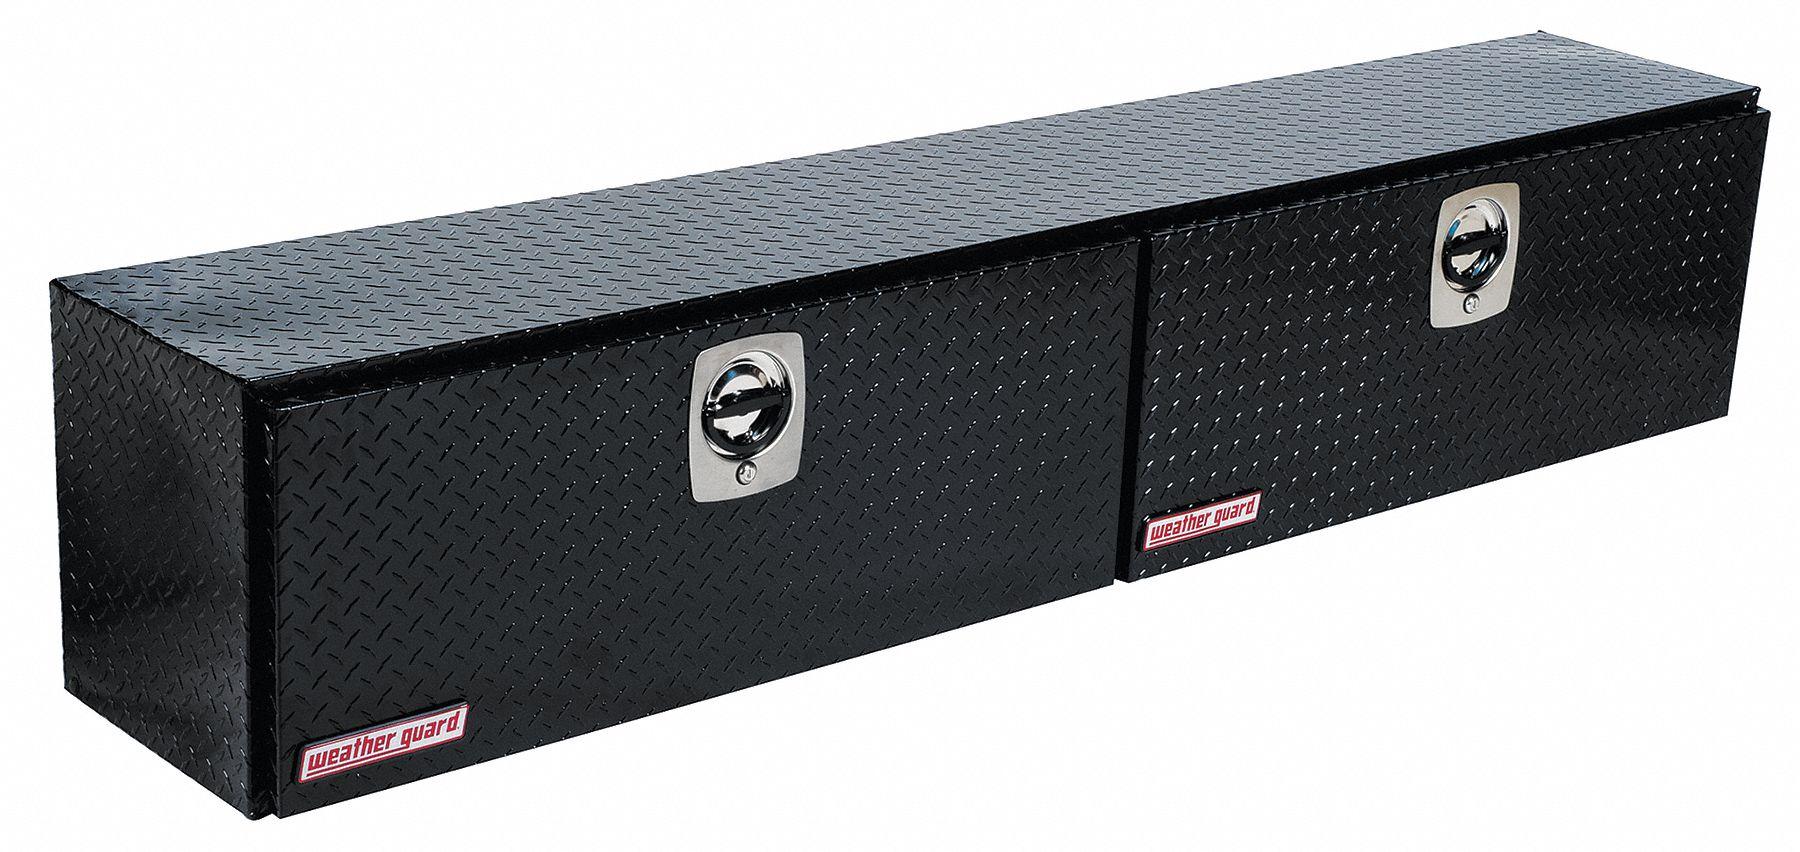 WEATHER GUARD Aluminum Topside Truck Box Black Double